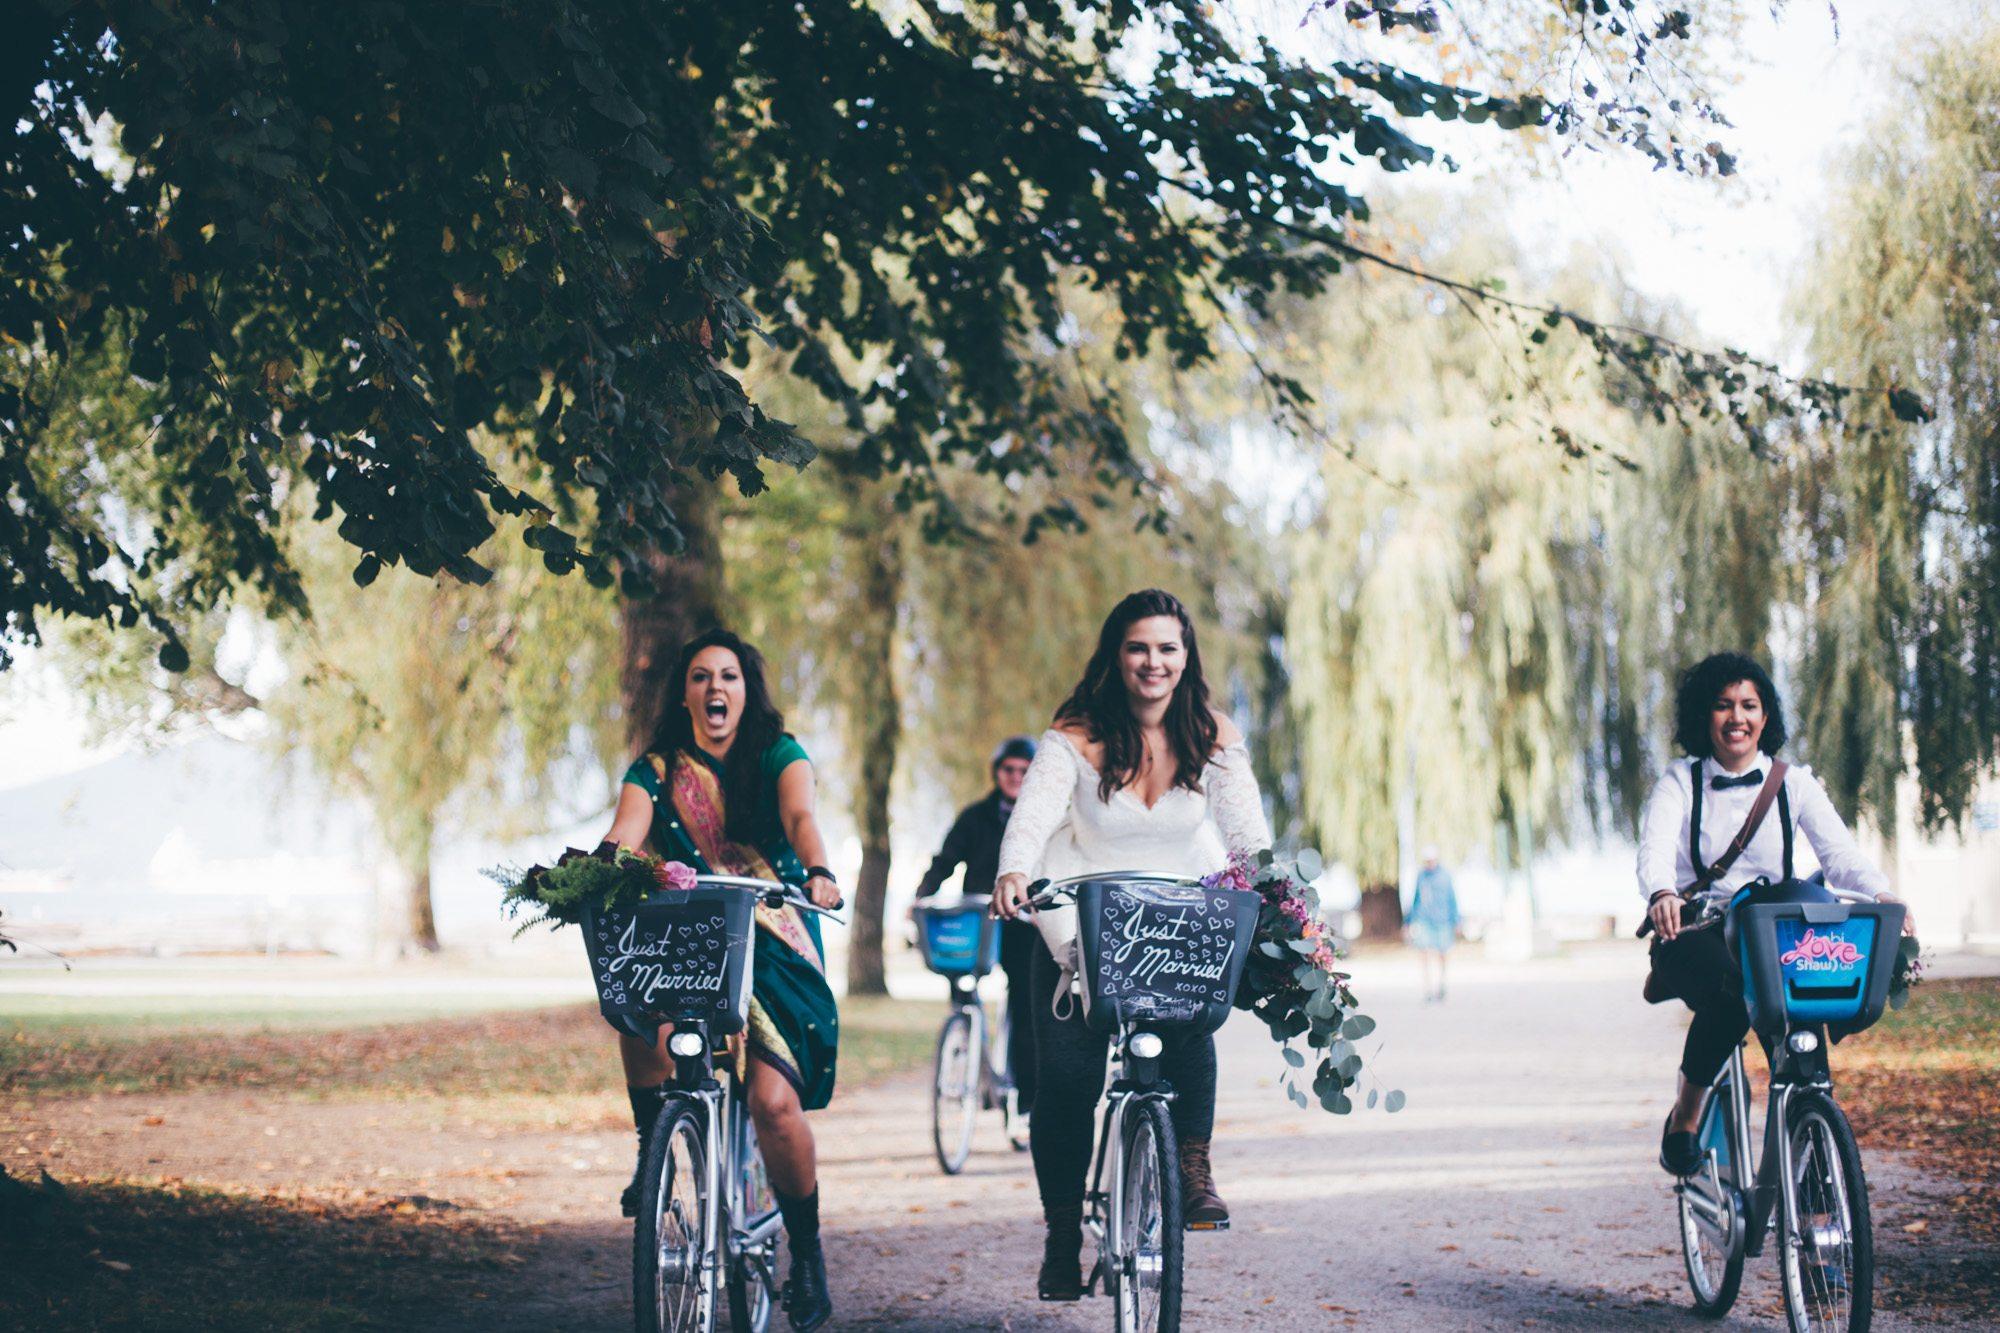 Newlyweds Leah Day and Kaitlin Straker on Mobi bikes (Kateland Abbigail Clarke)